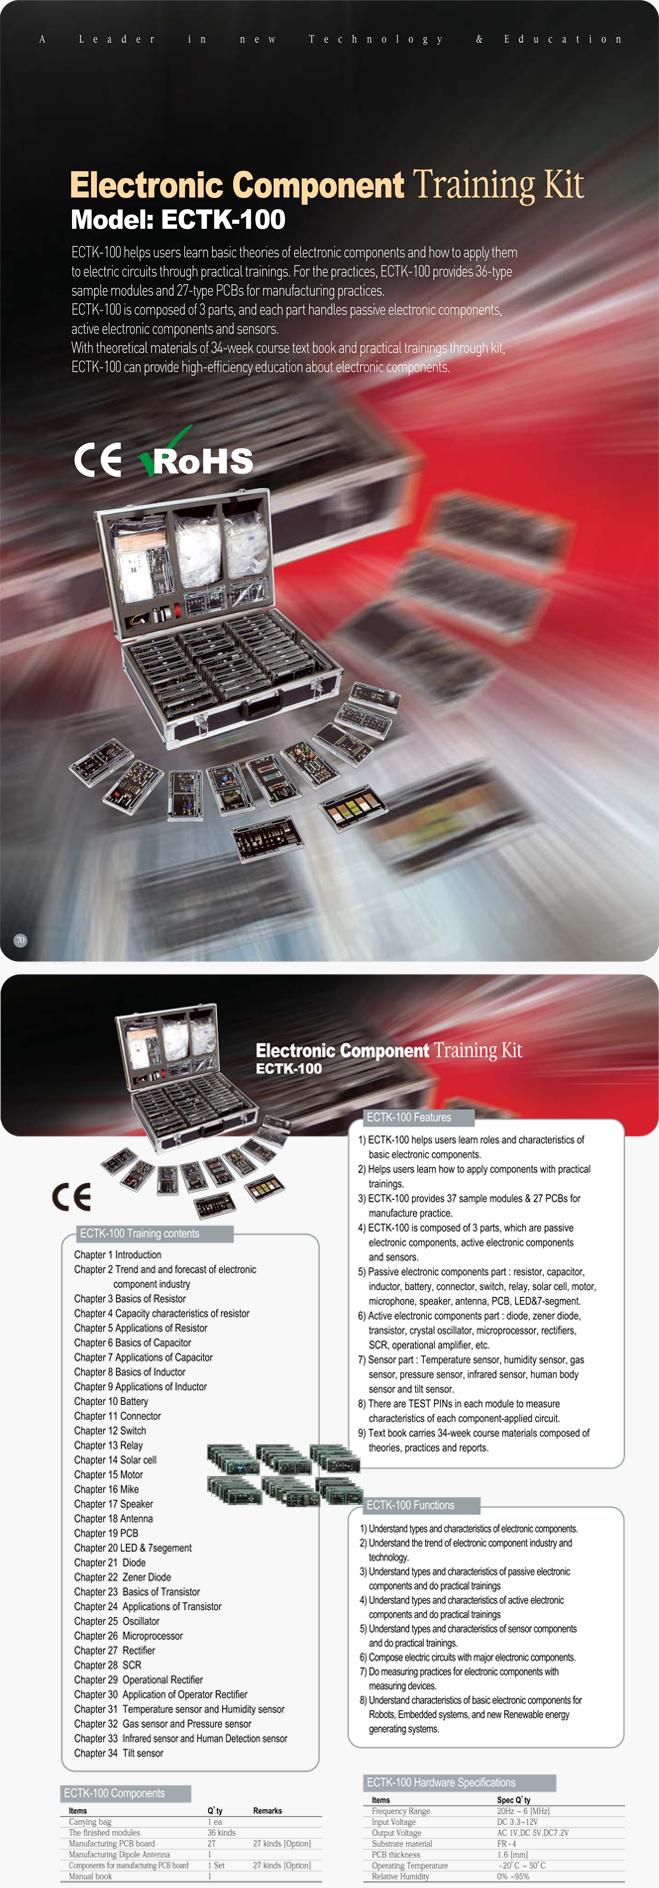 Man & Tel Electronic Component Training Kit ECTK-1000